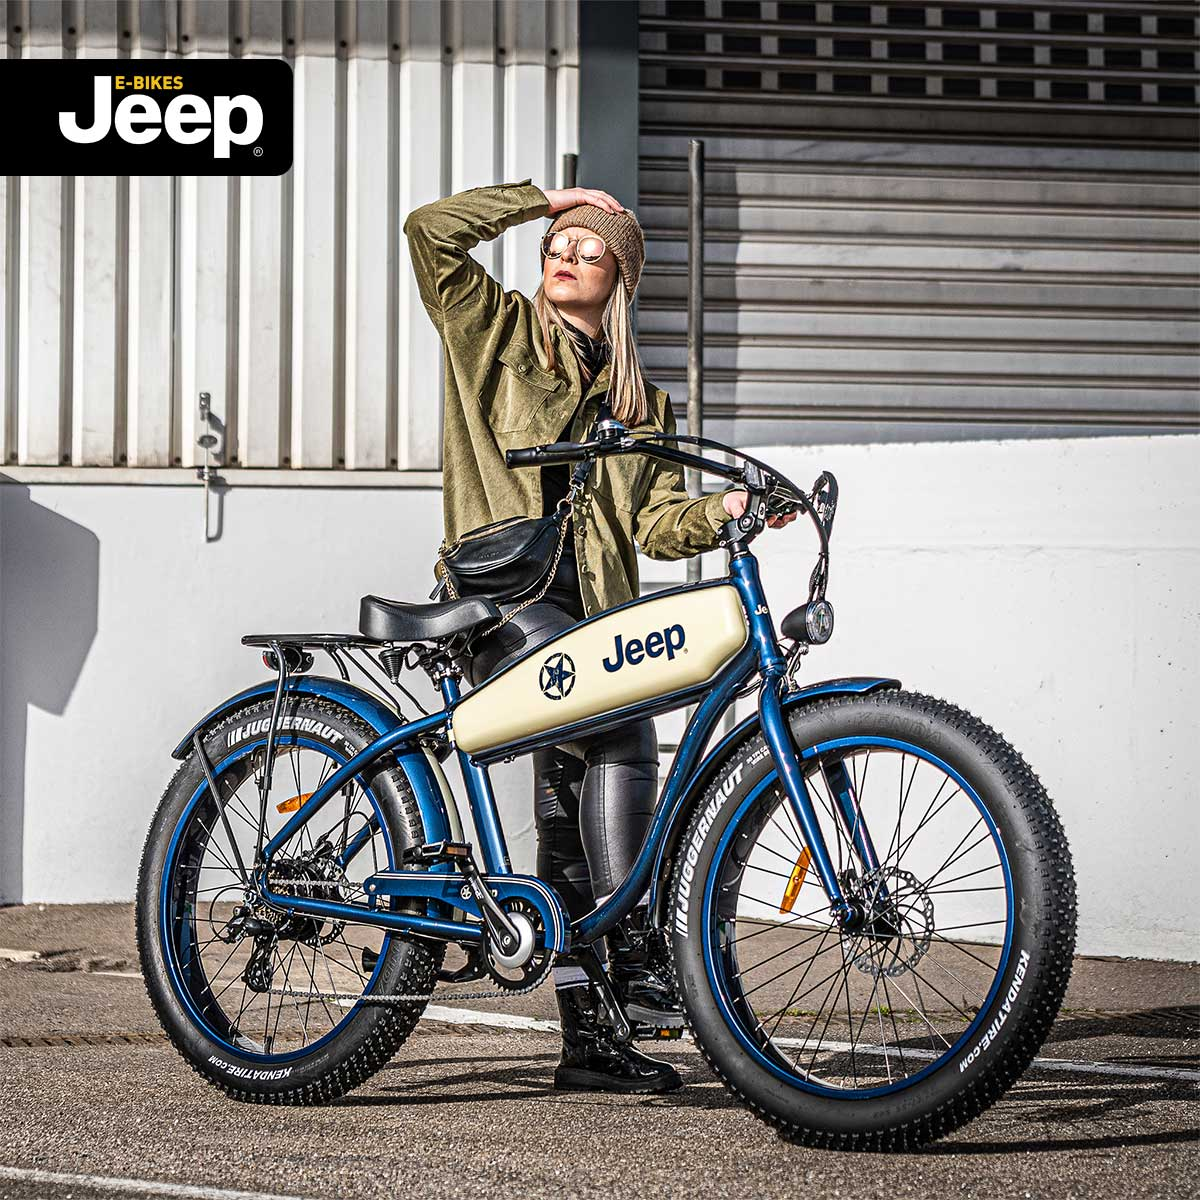 PI vom 10.03.2021 | Jeep Cruise E-Bike